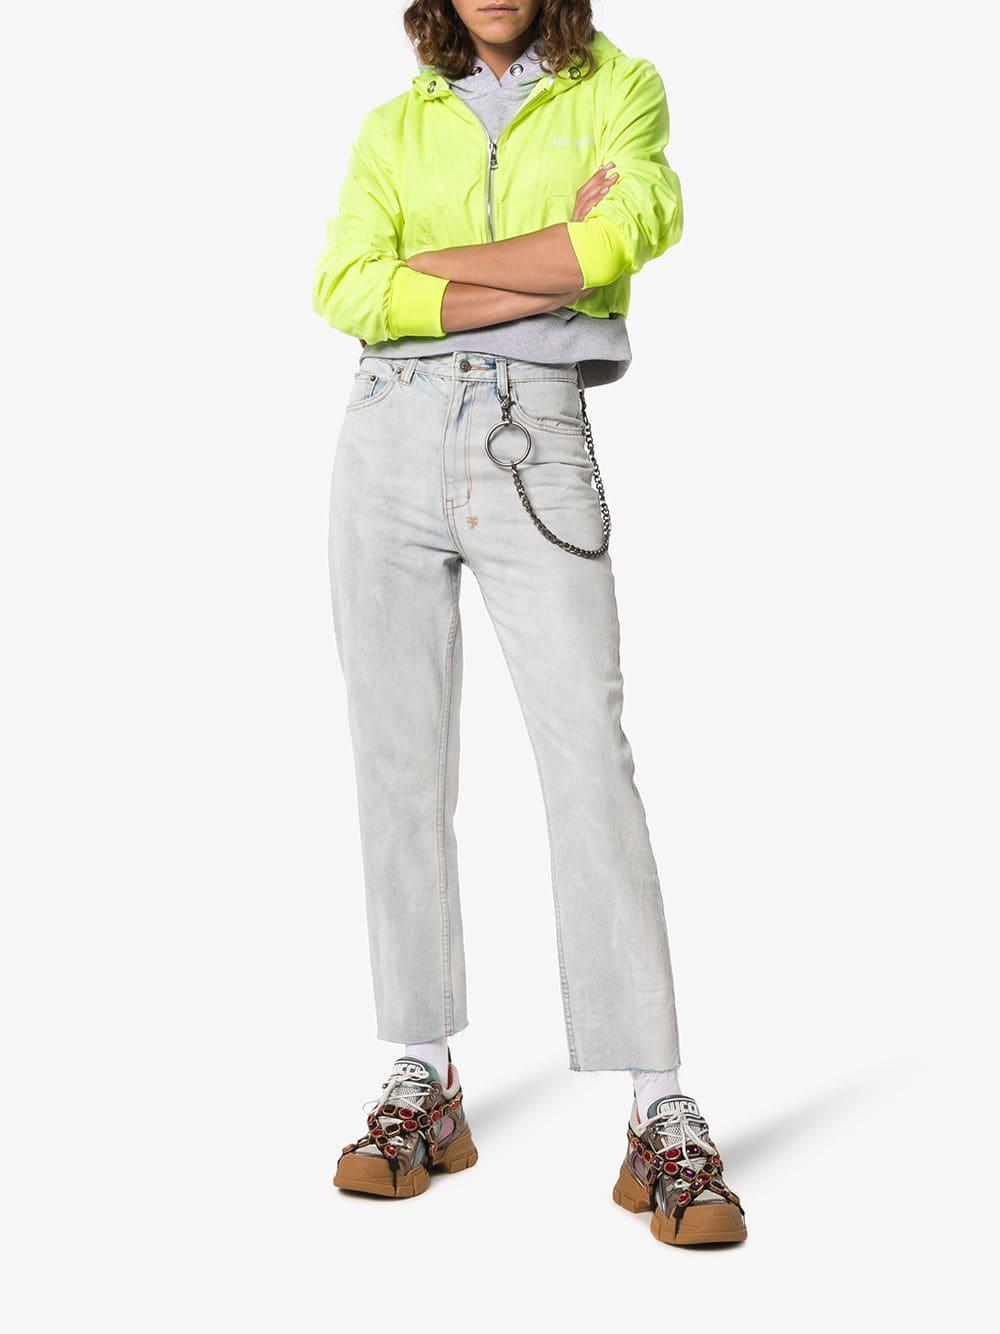 dbf5aa8ef650f Lyst - Gucci Multicoloured Metallic Flashtrek Removable Crystal Sneakers in  Metallic - Save 6%